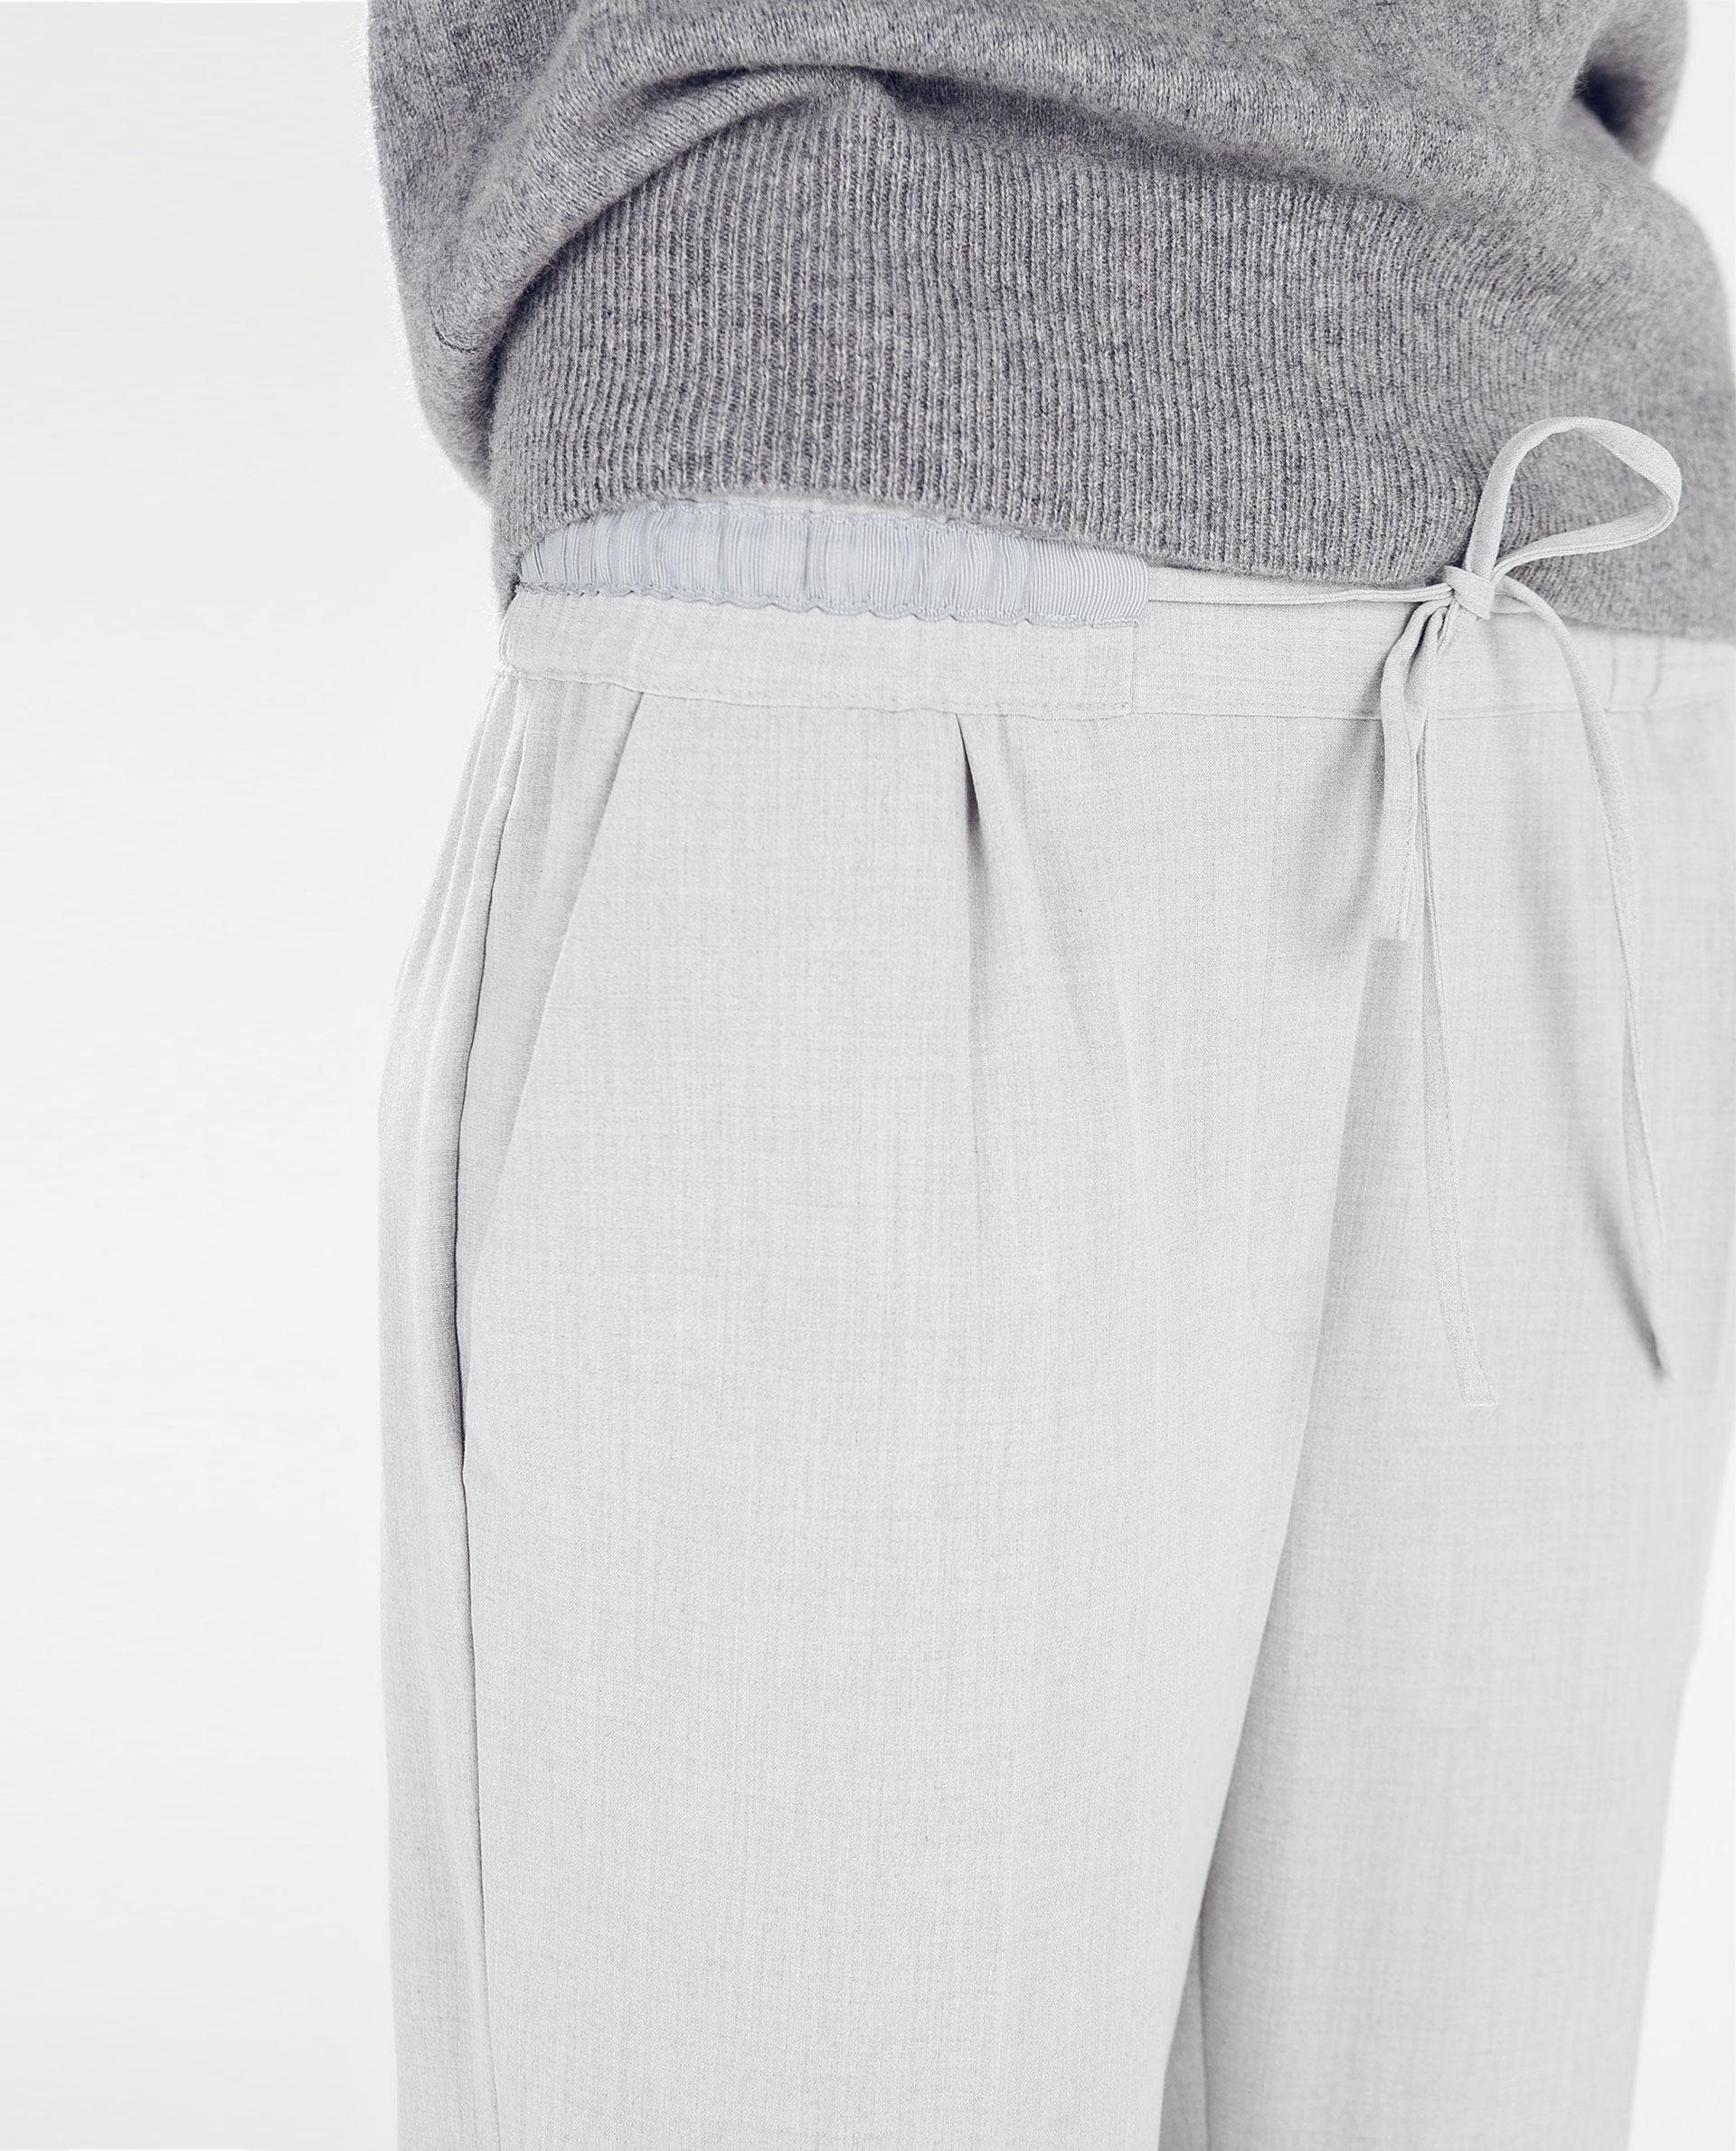 9563eb4e DRAWSTRING TROUSERS - Joggers - Trousers - WOMAN | ZARA United States